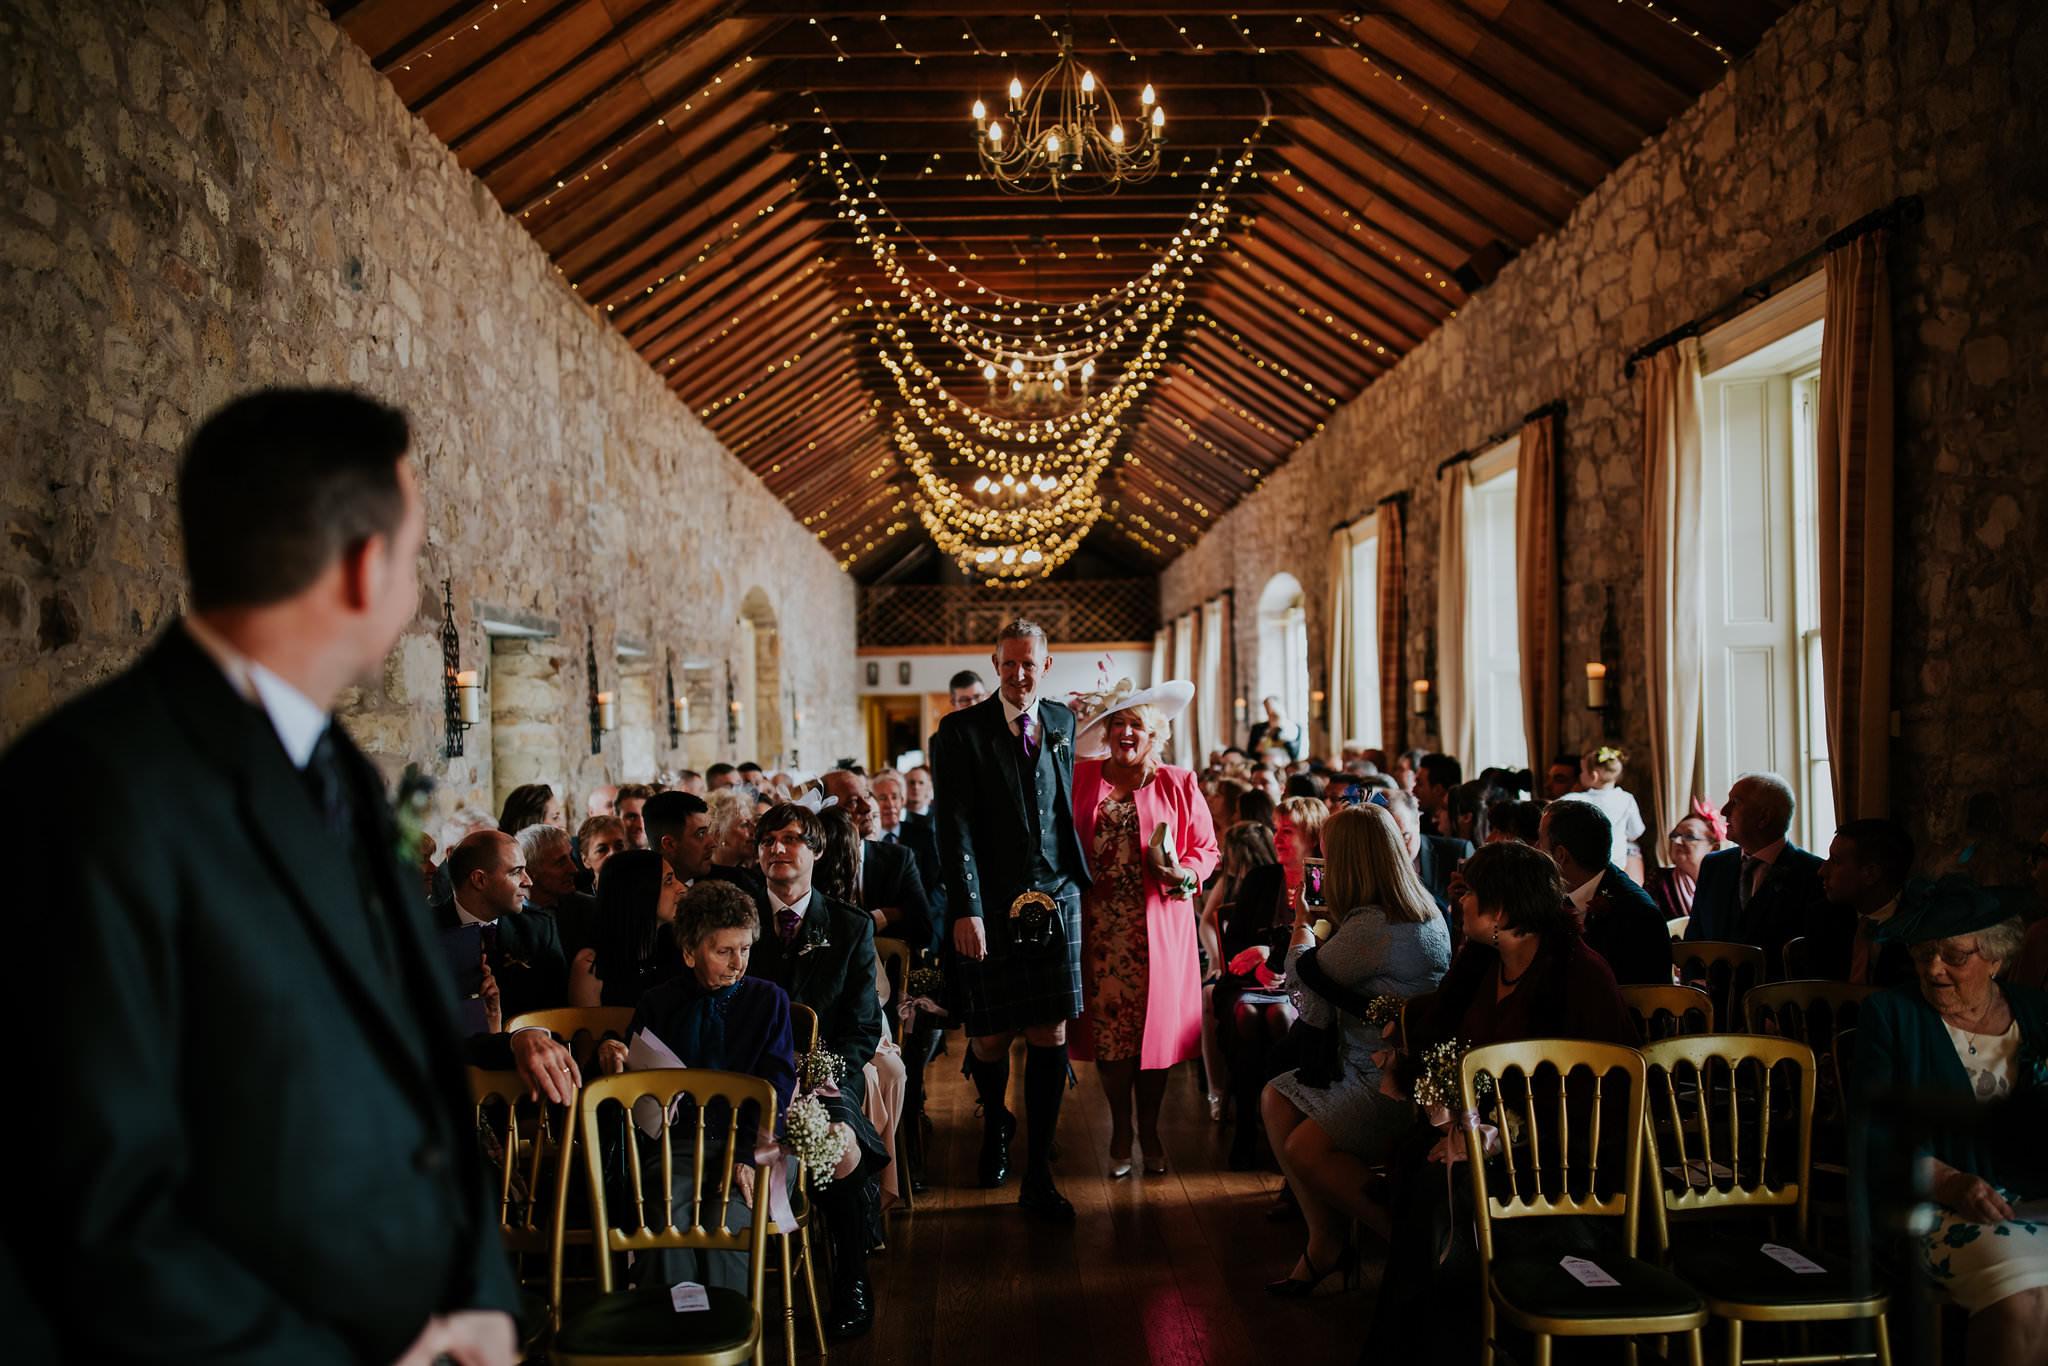 kirknewton stables wedding photographer (28).jpg